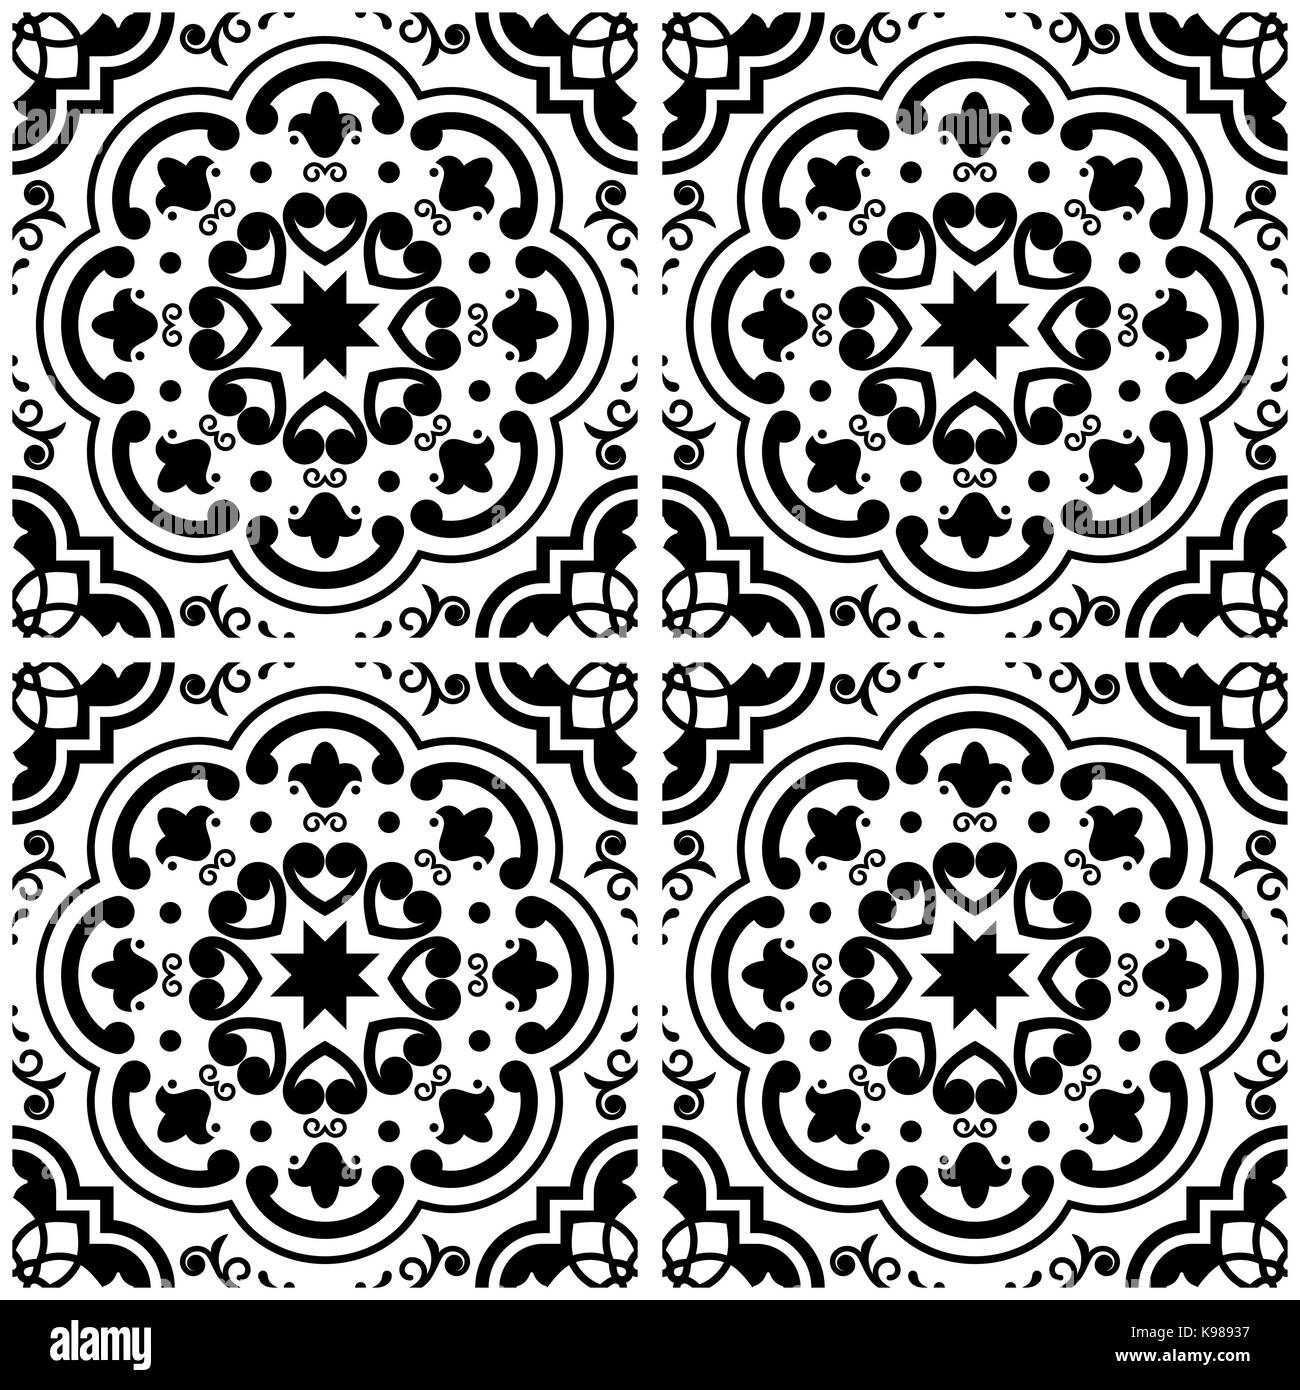 Azulejos Portuguese tile floor pattern, Lisbon seamless black and white tiles, vintage geometric ceramics - Stock Vector